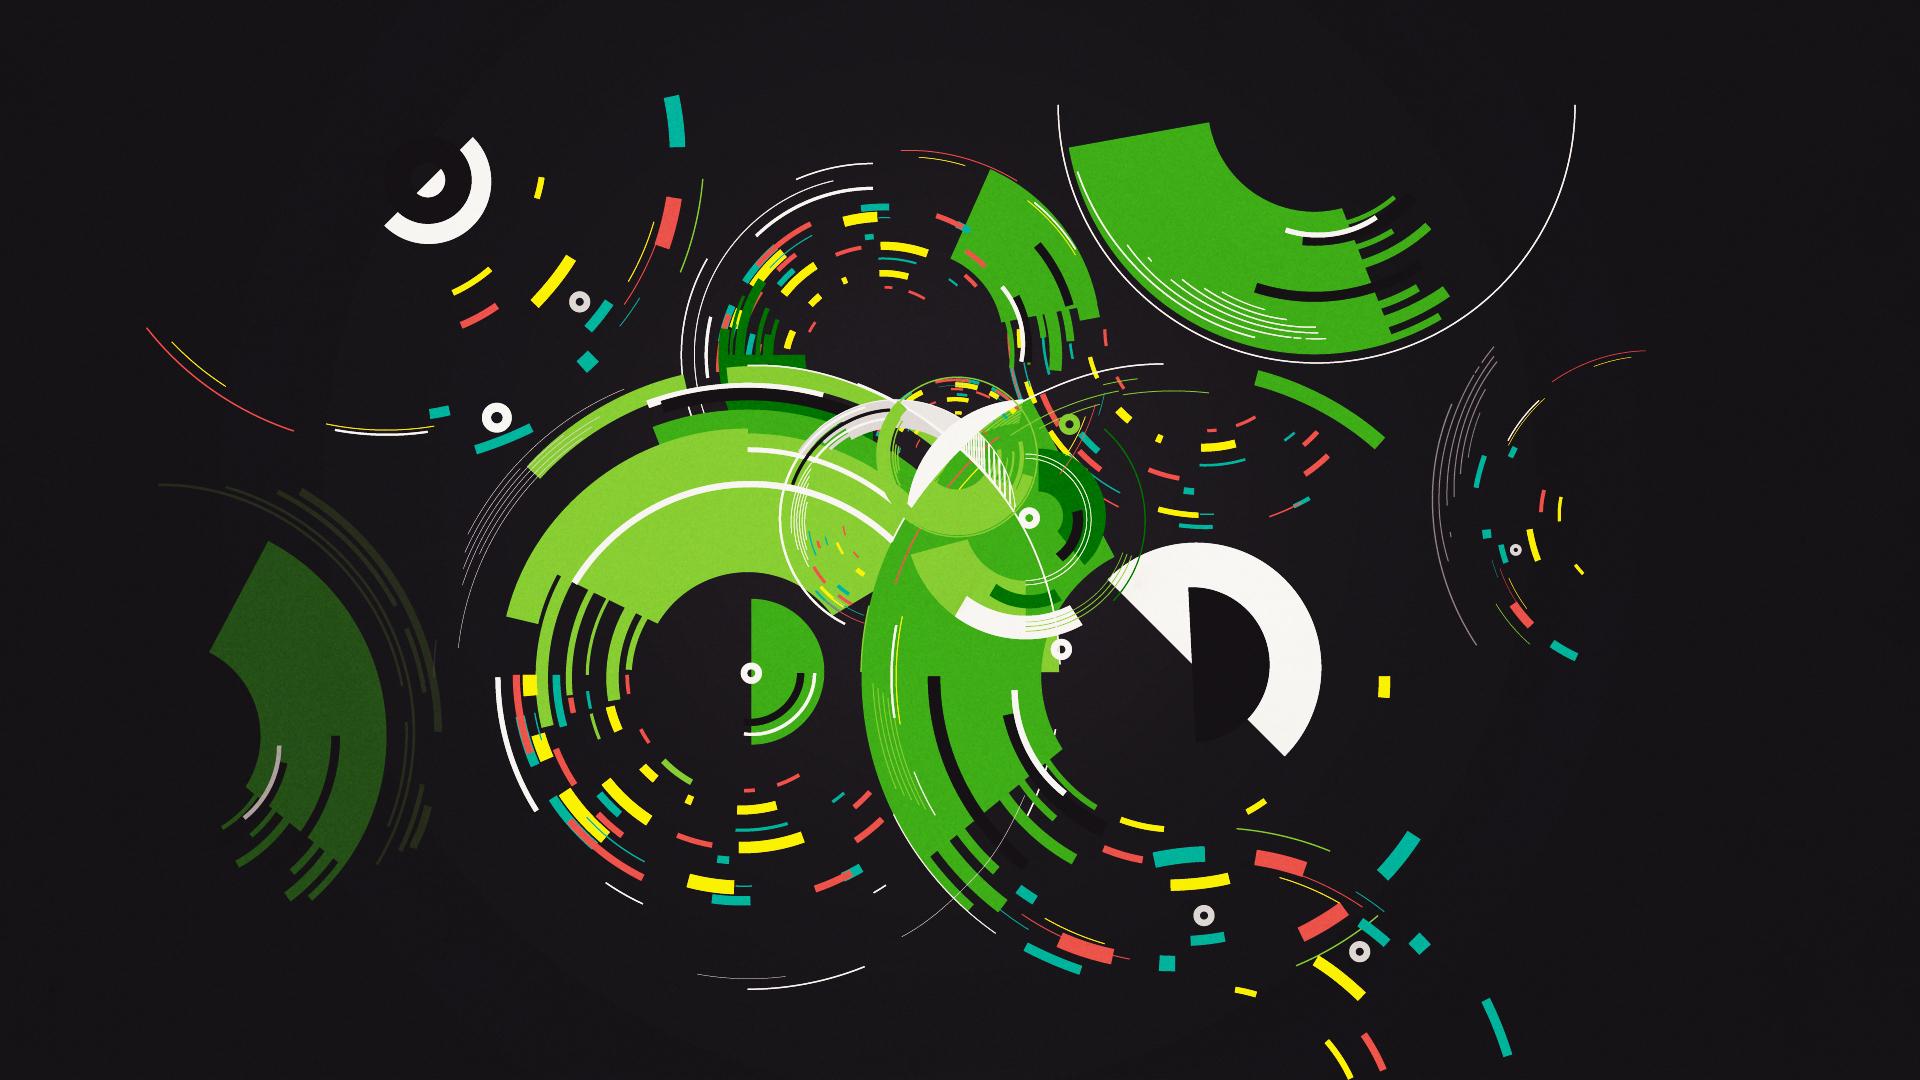 Buck - 2013 - Xbox Pitch Frame 14.jpg